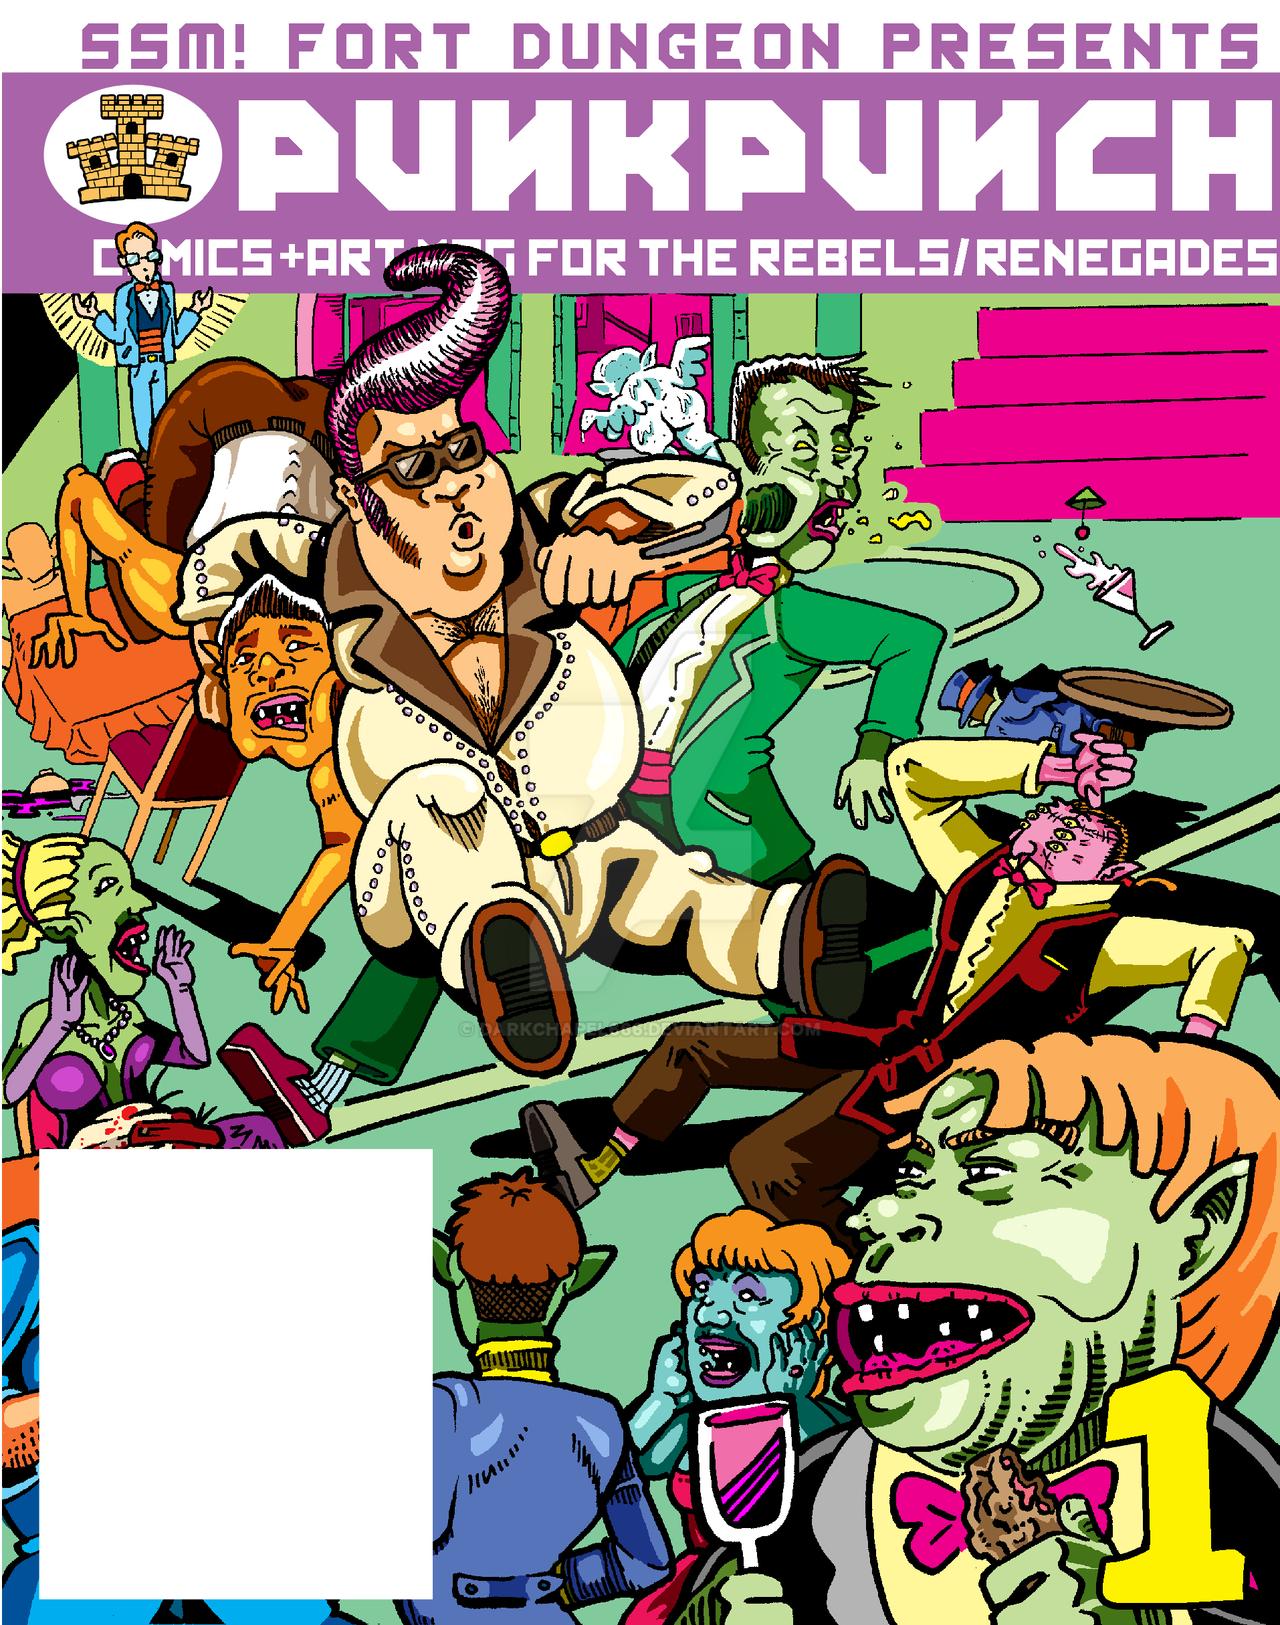 Punkpunch : Chris Benoit by darkchapel666